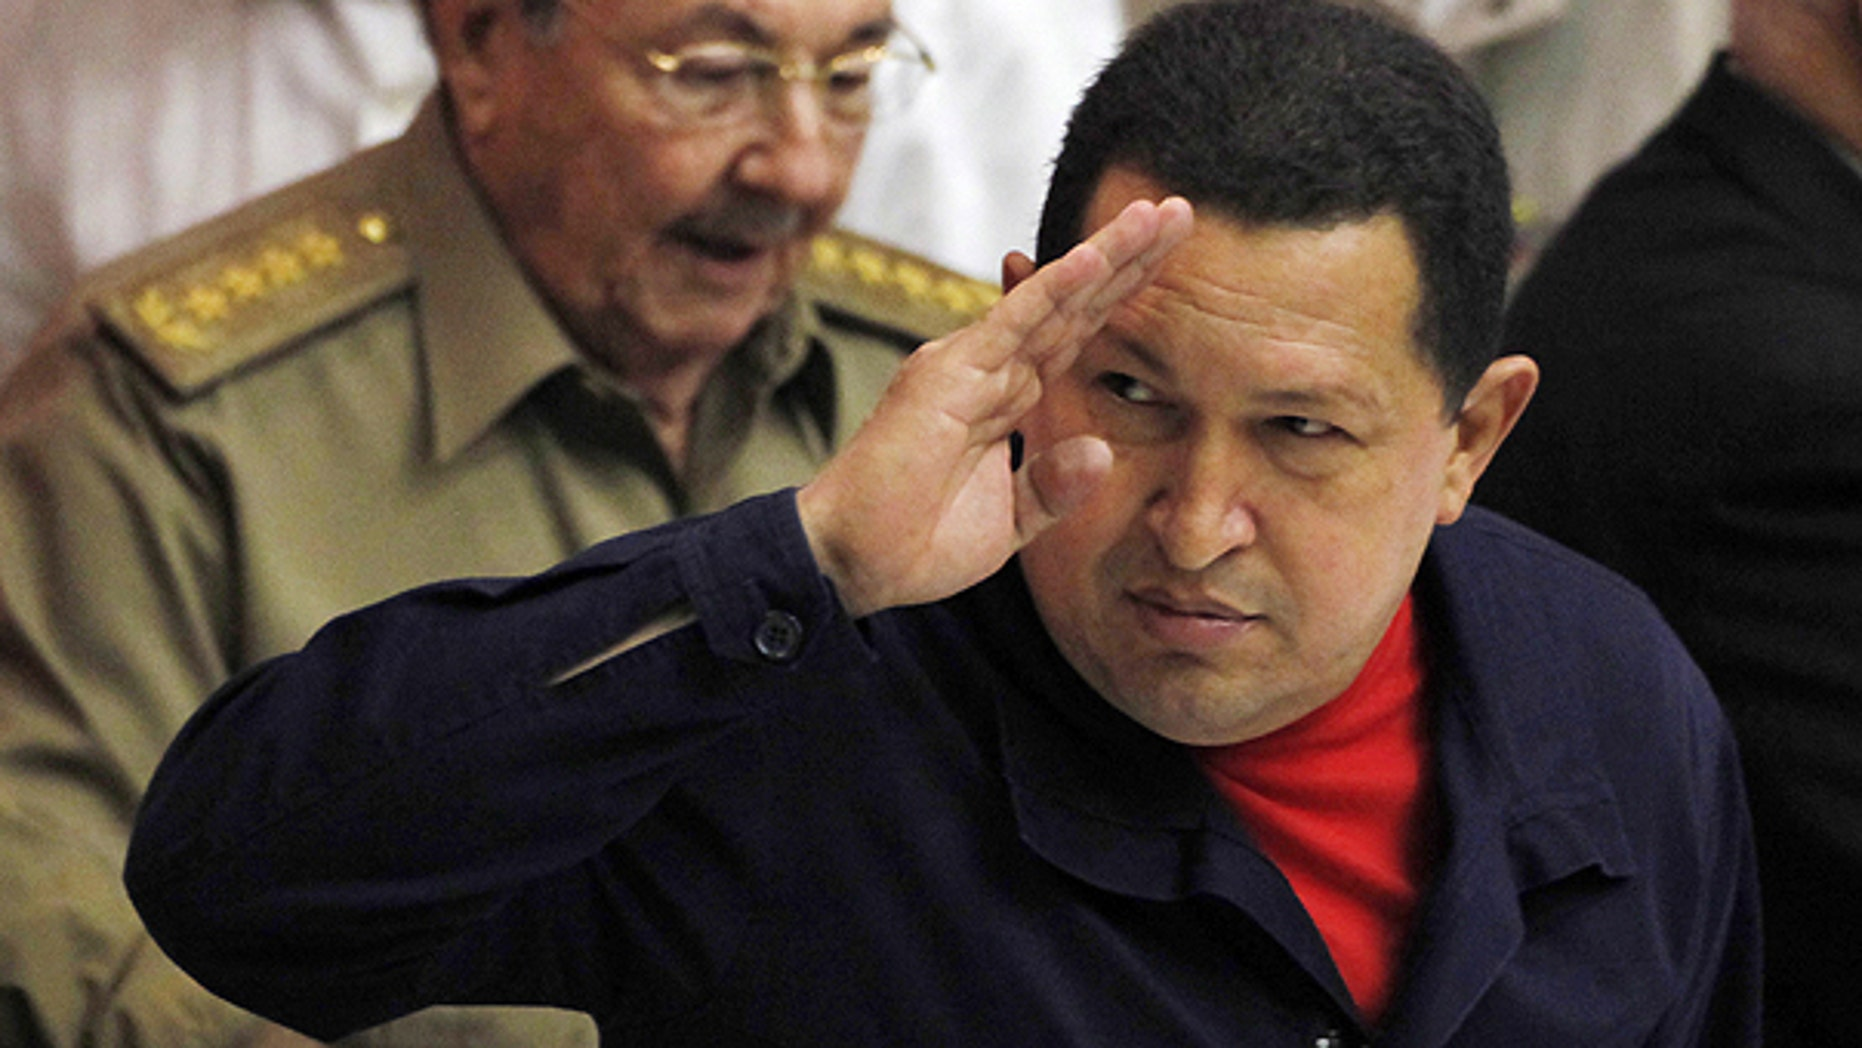 Nov. 8, 2010: Venezuela's President Hugo Chavez salutes during a meeting in Havana, Cuba.